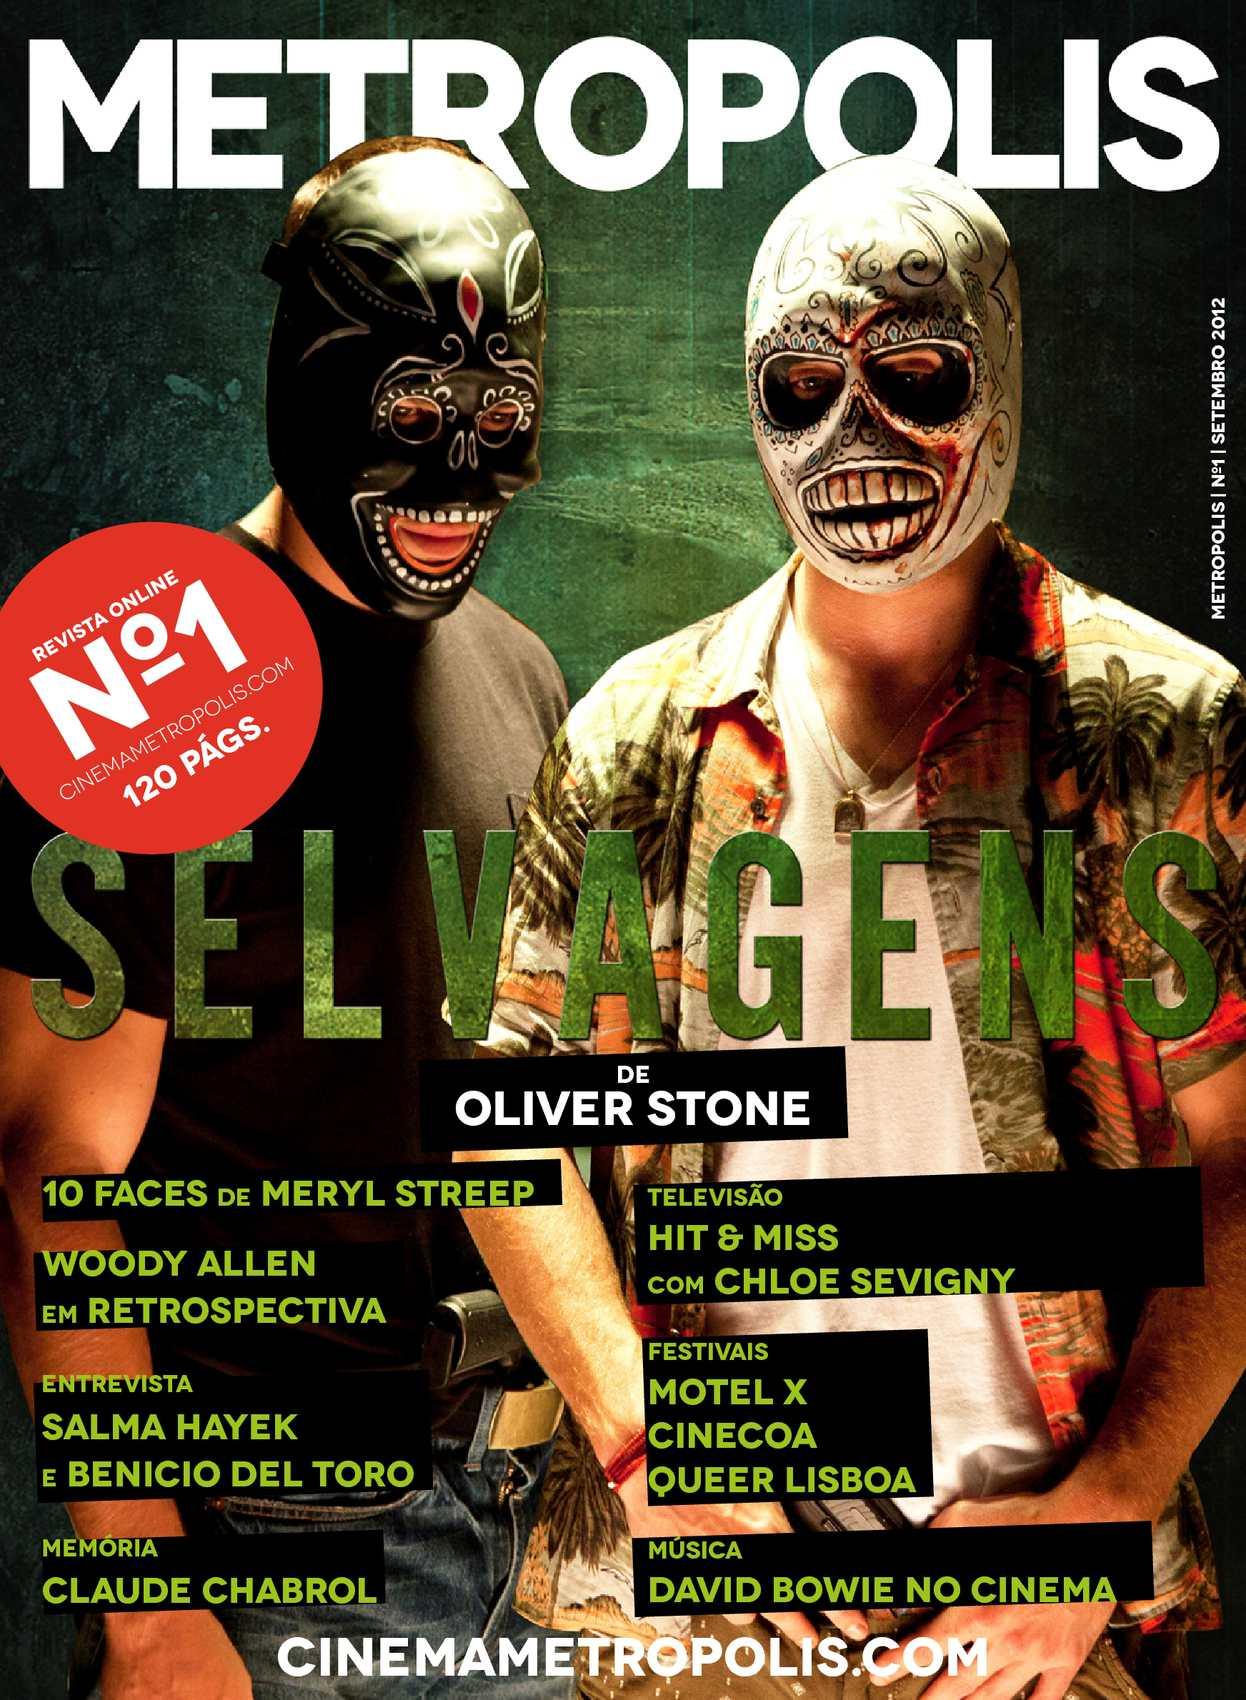 METROPOLIS Ed. 1 Setembro 2012